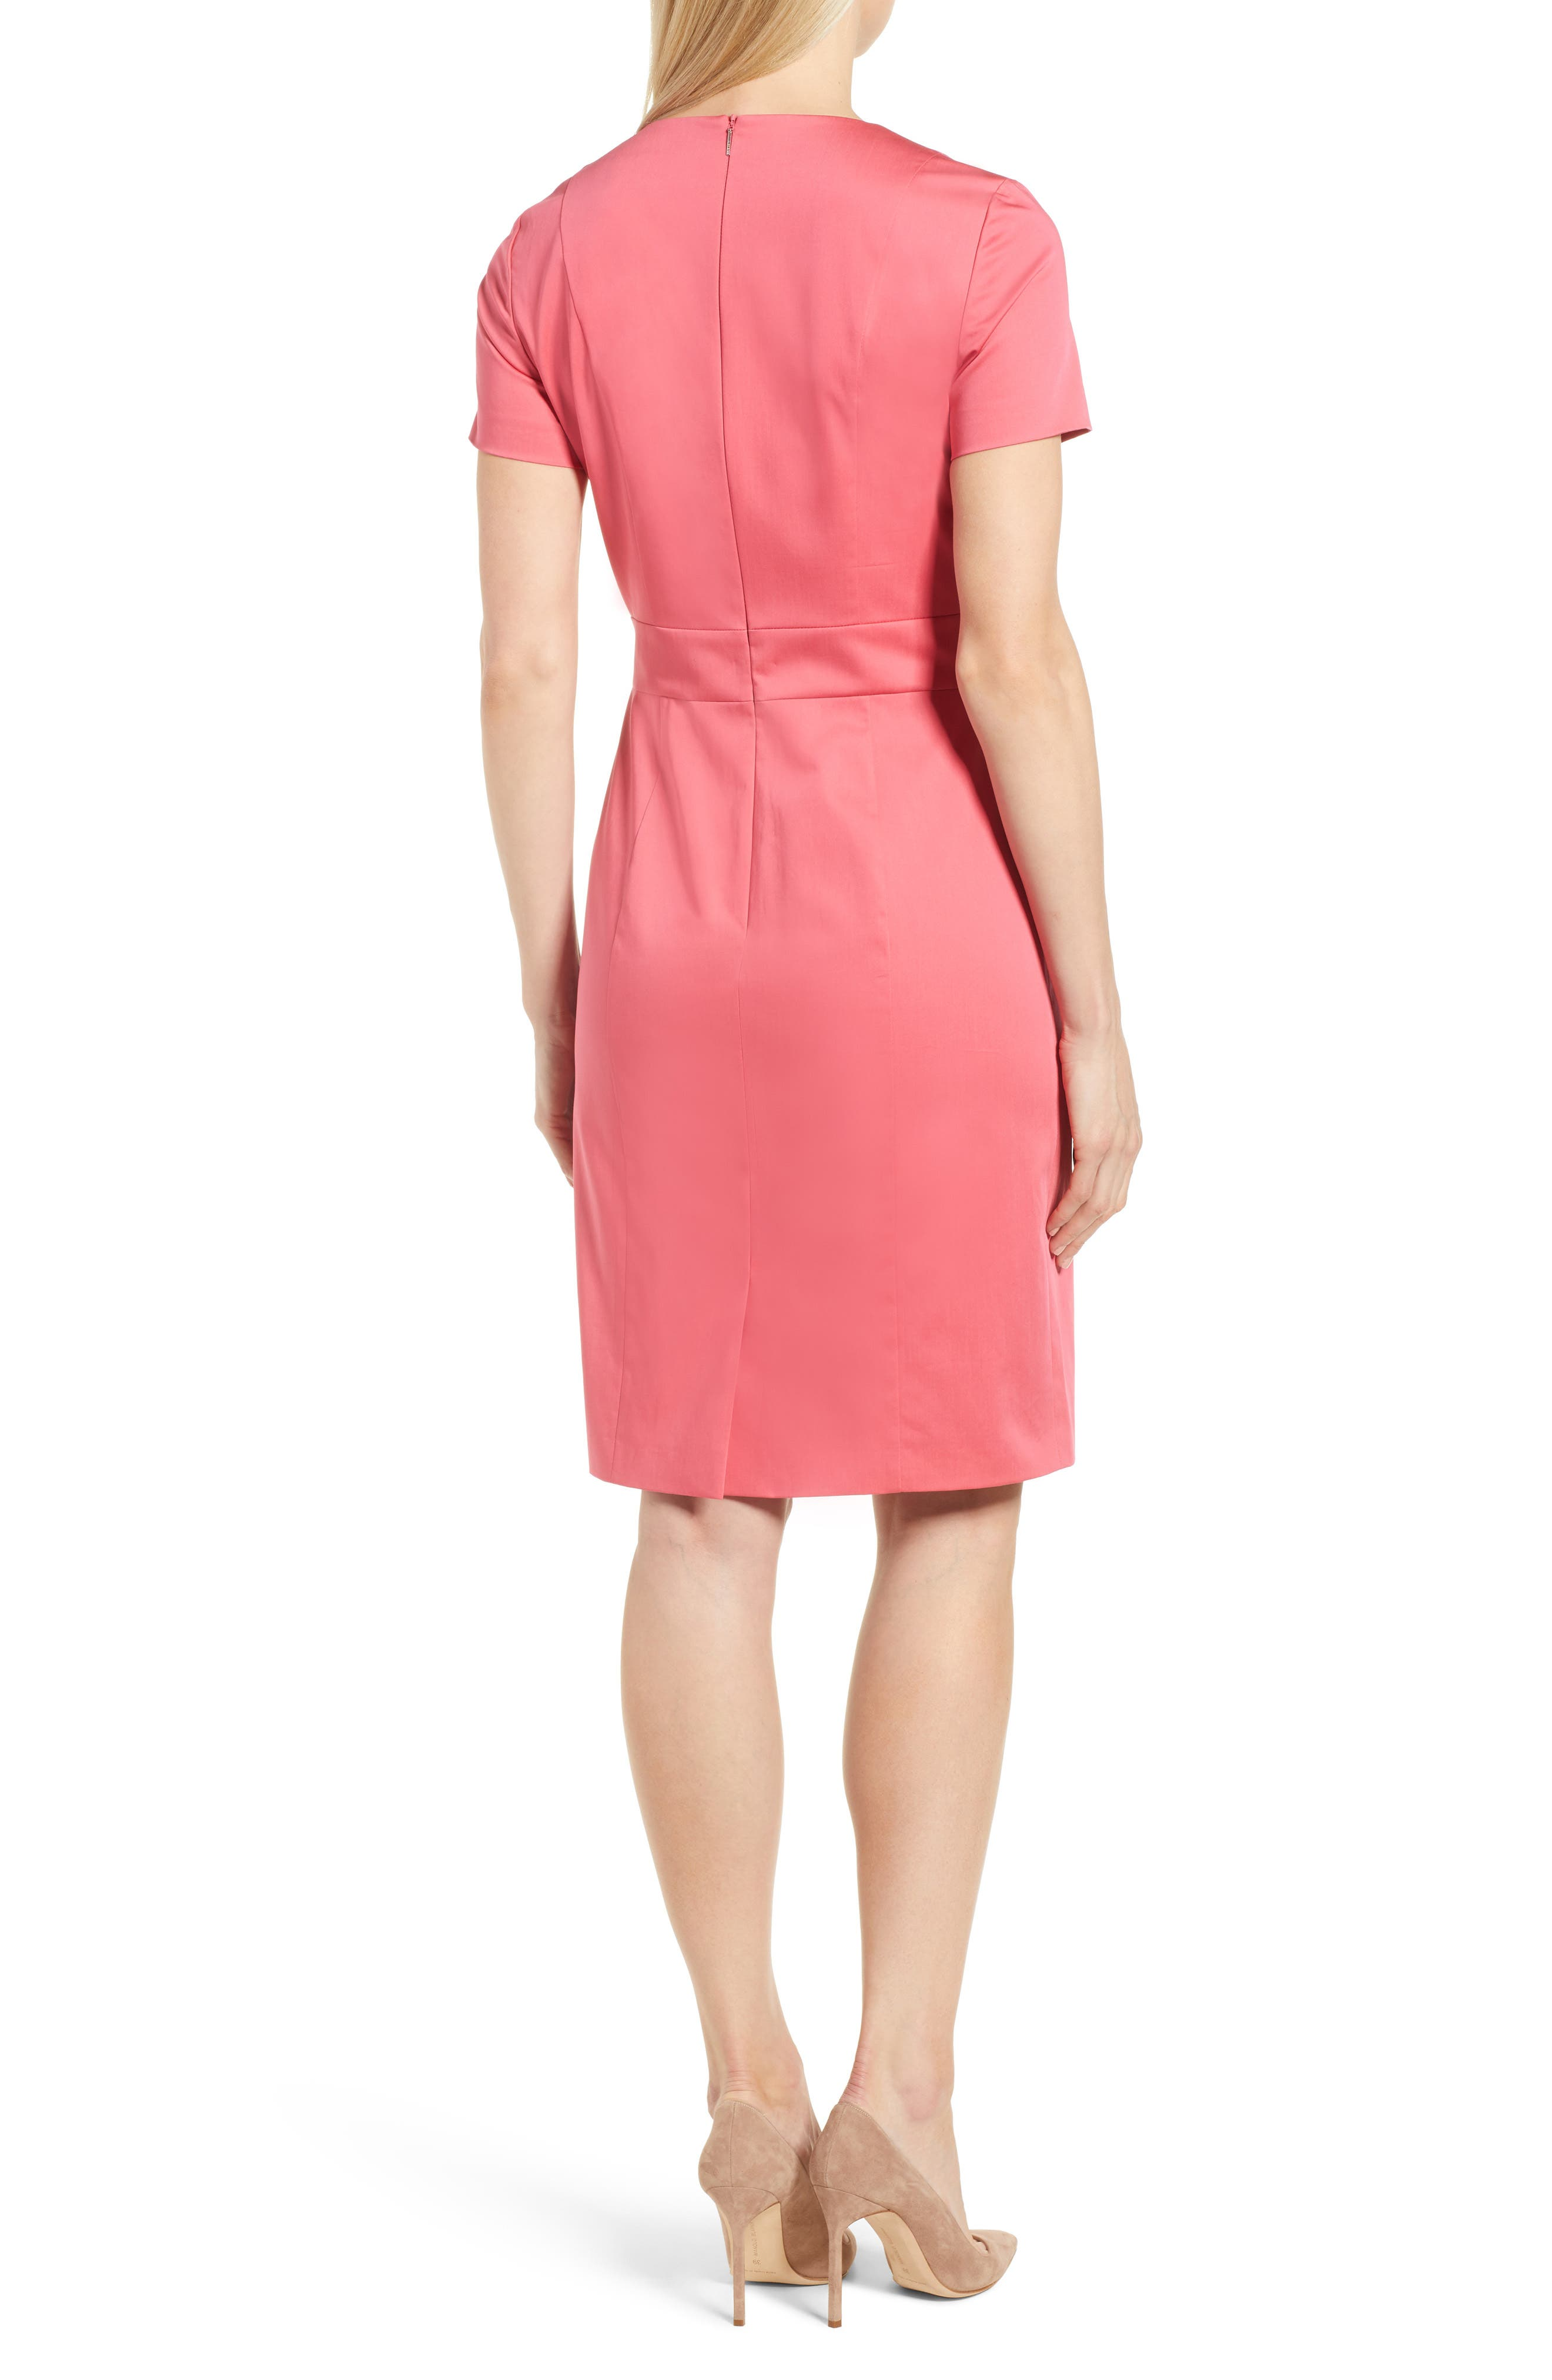 Dasali V-Neck Sheath Dress,                             Alternate thumbnail 2, color,                             Lychee Pink